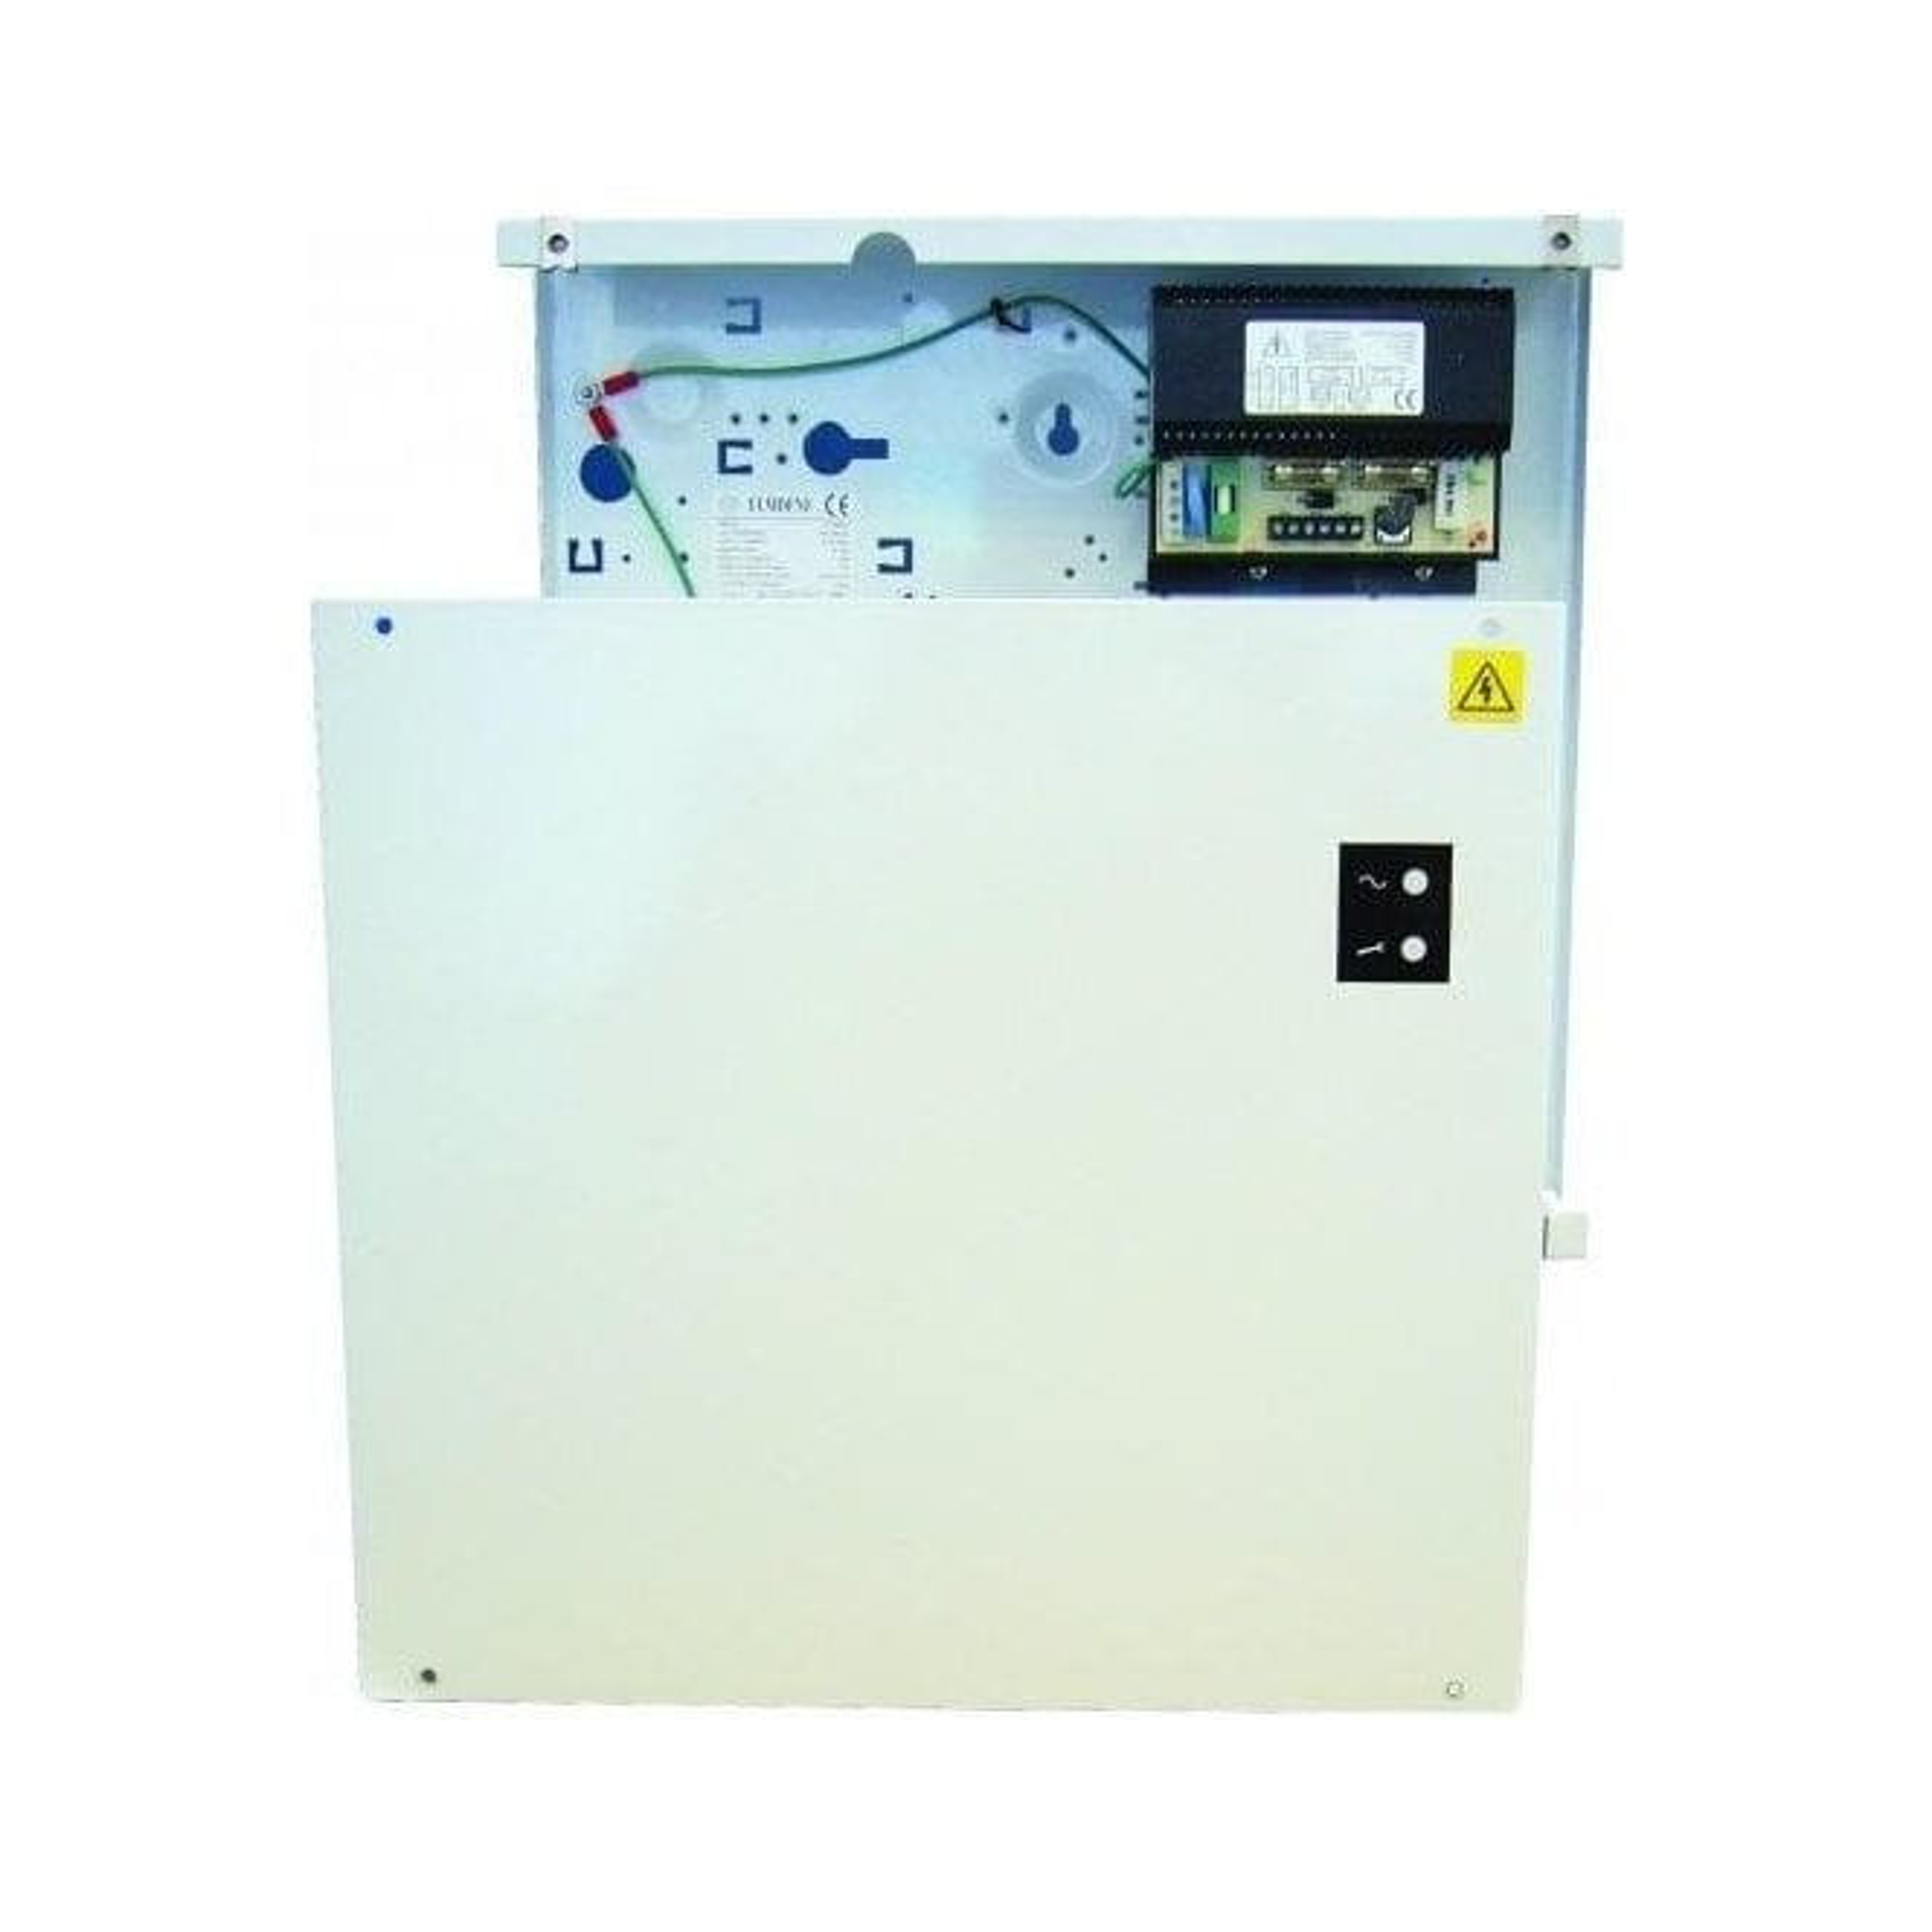 CDVI 12Vdc, 1A Power Supply - Standard Case